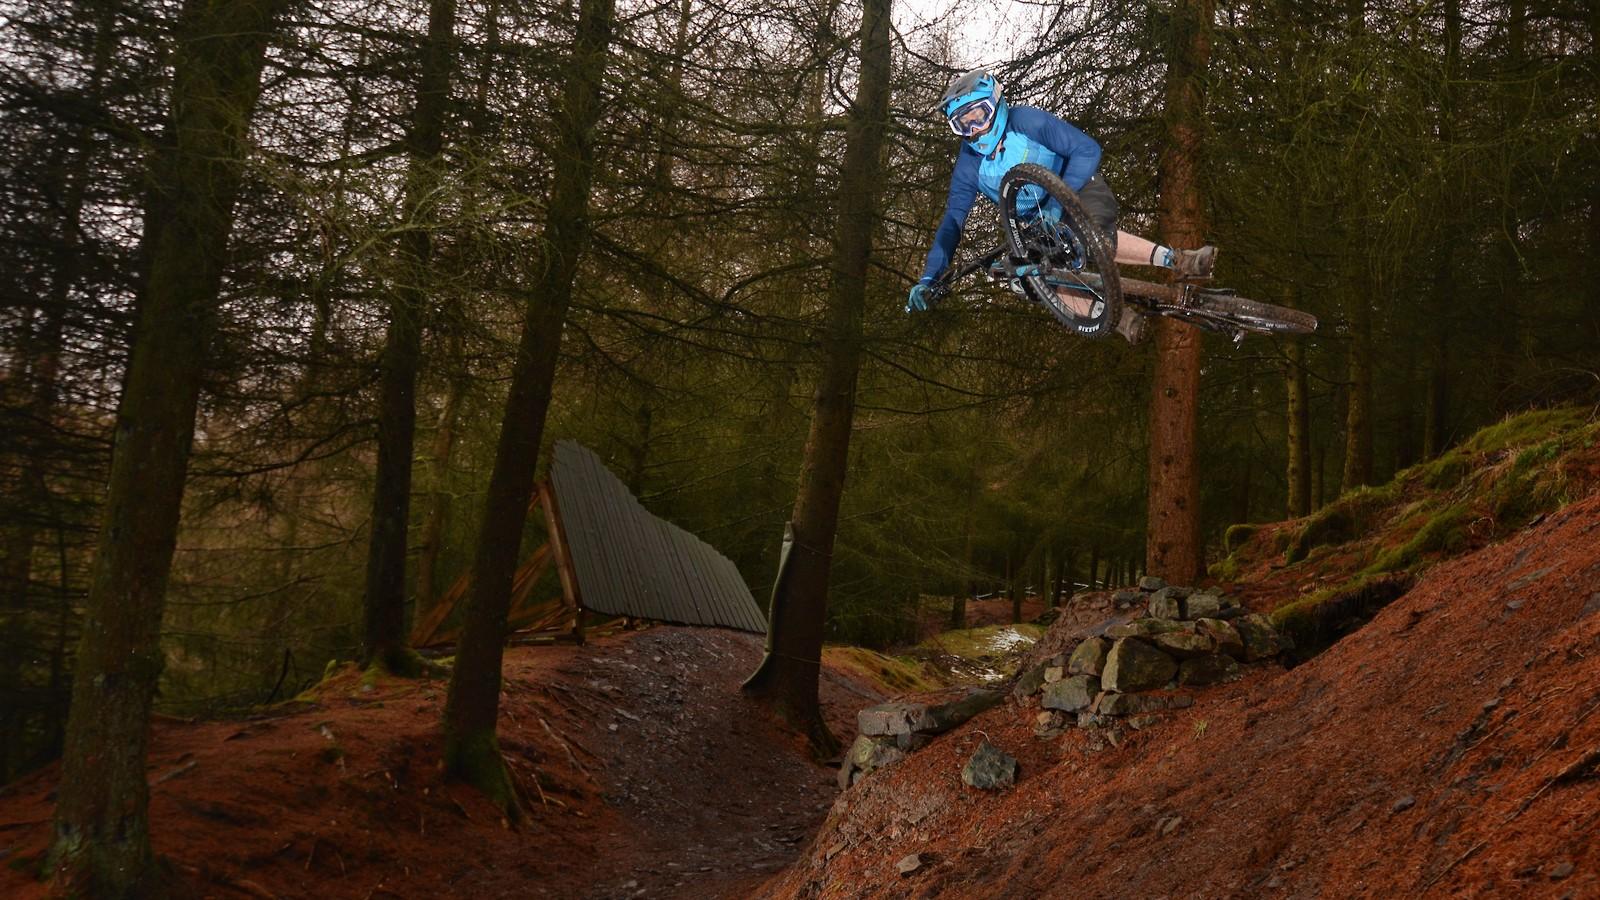 laying it Flat - t3rribl3on3 - Mountain Biking Pictures - Vital MTB